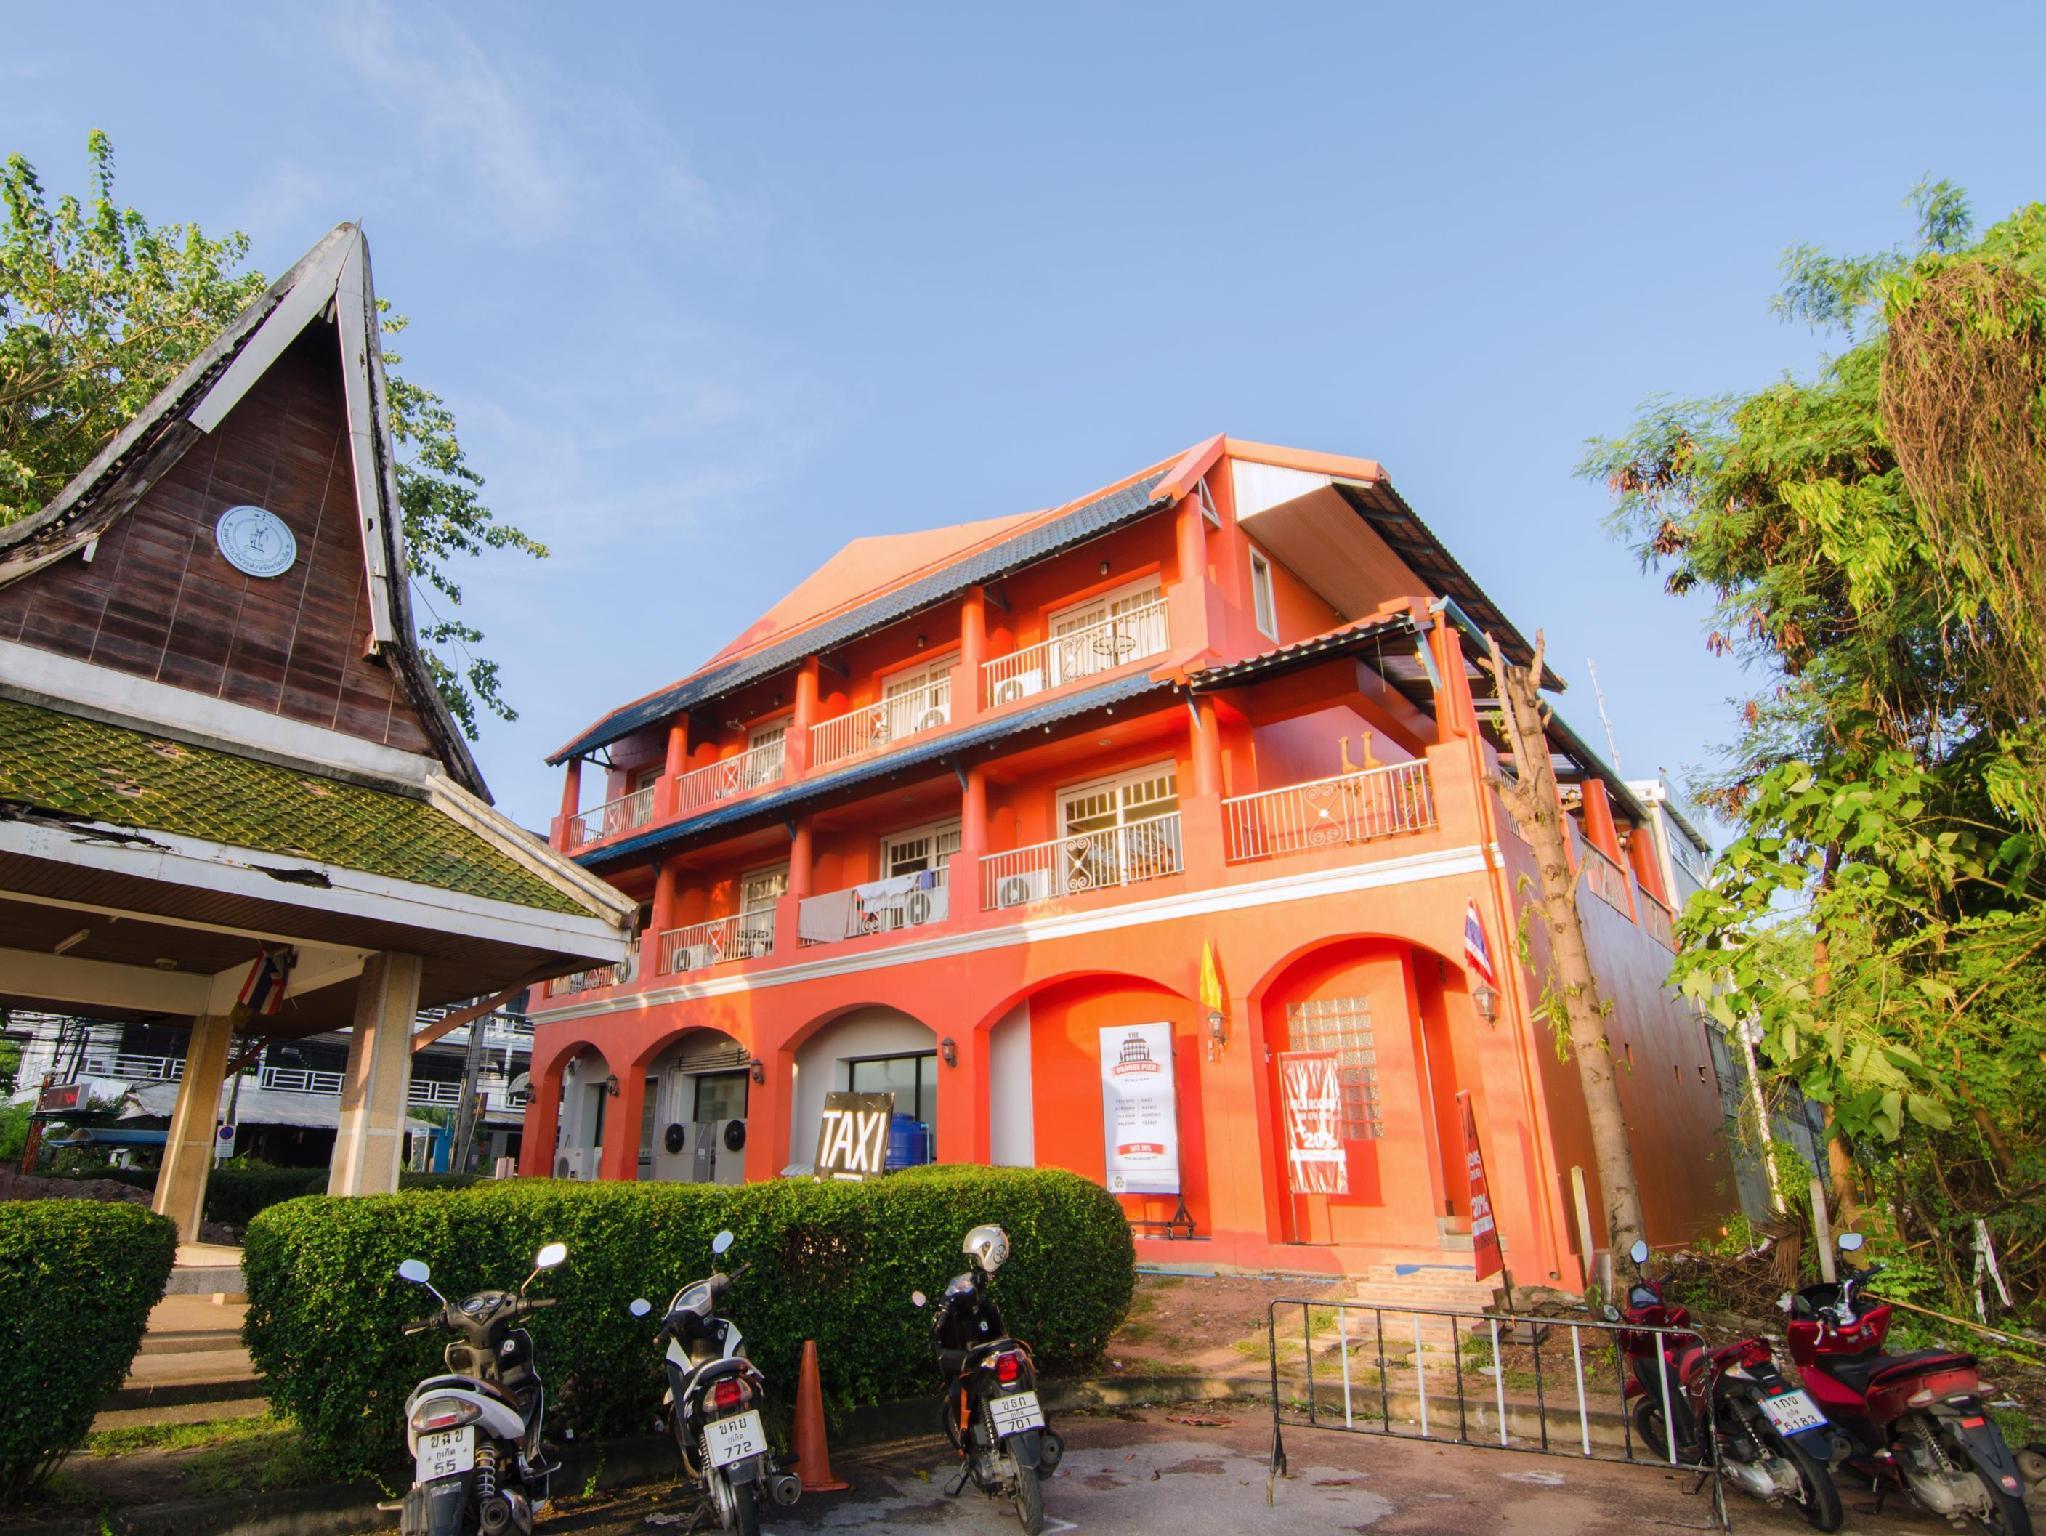 The Orange Pier Guesthouse